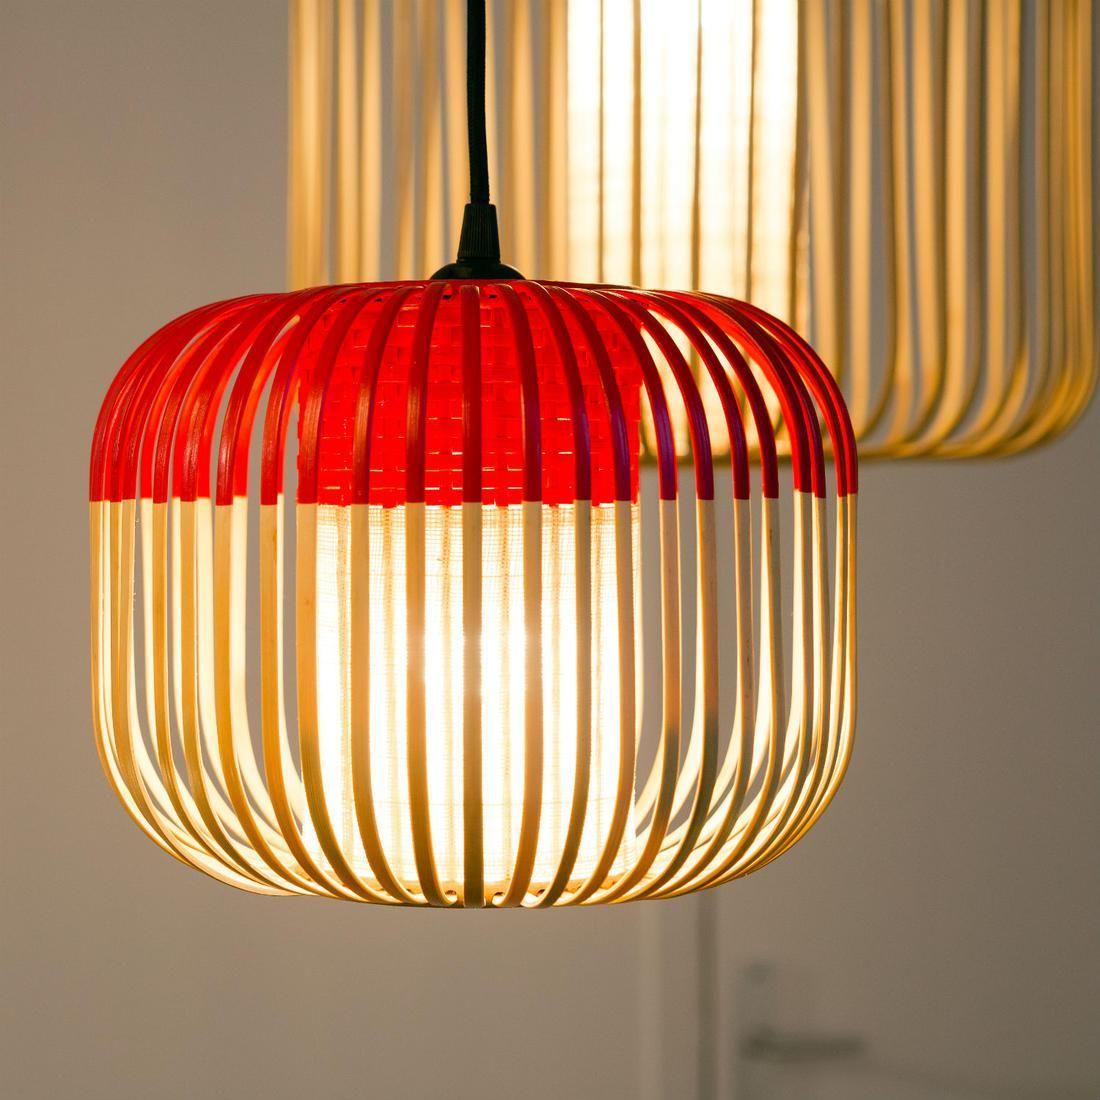 Pin by lightonline on forestier pinterest ceiling fan luster